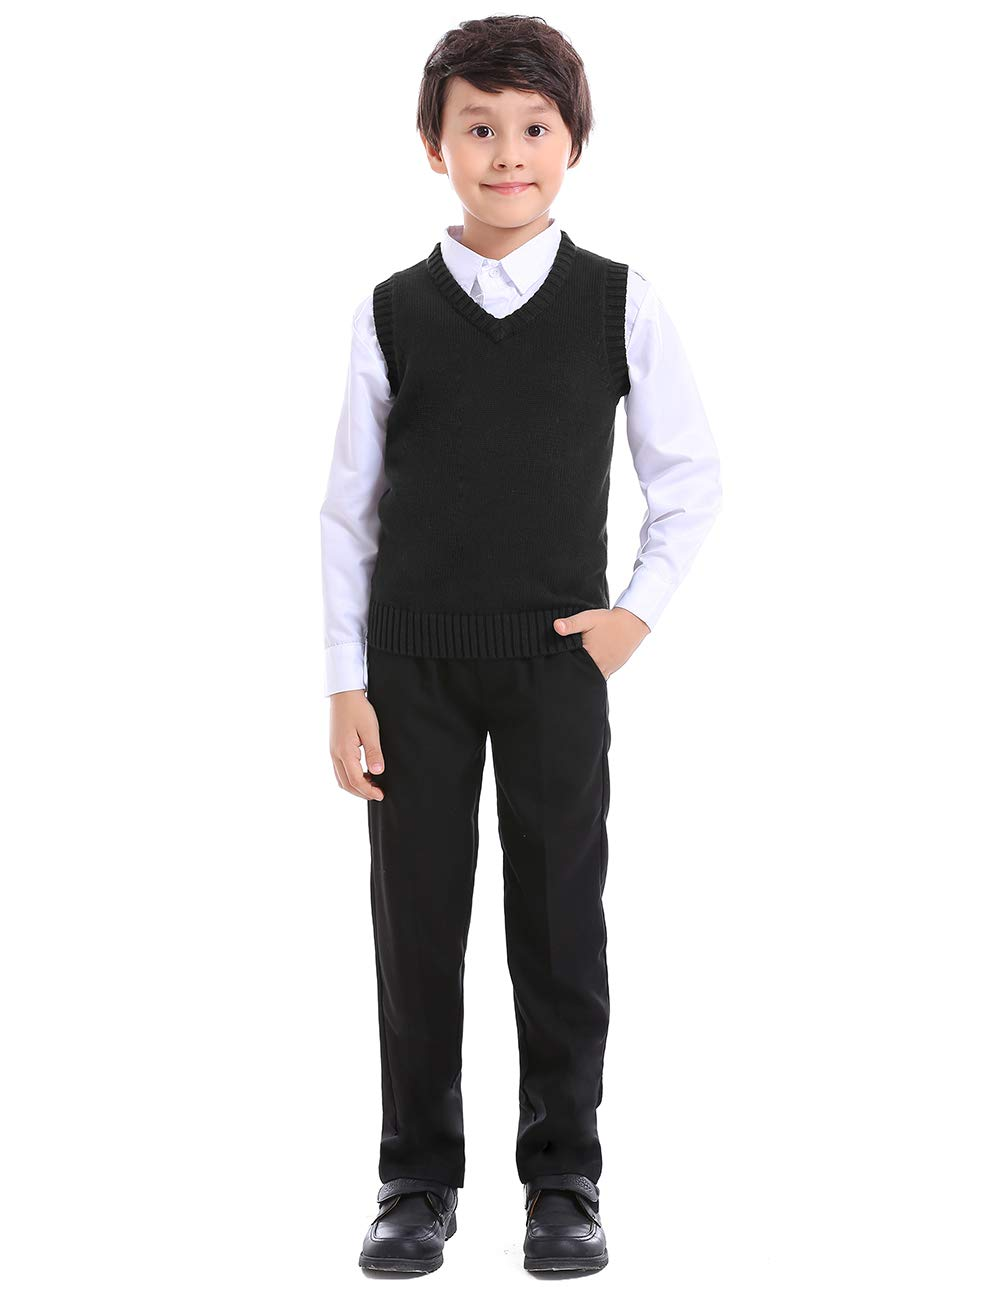 TopTie Boys V-Neck Cotton Knit Sleeveless Pullover School Uniform Sweater Vest (Navy/Black)-Black-12